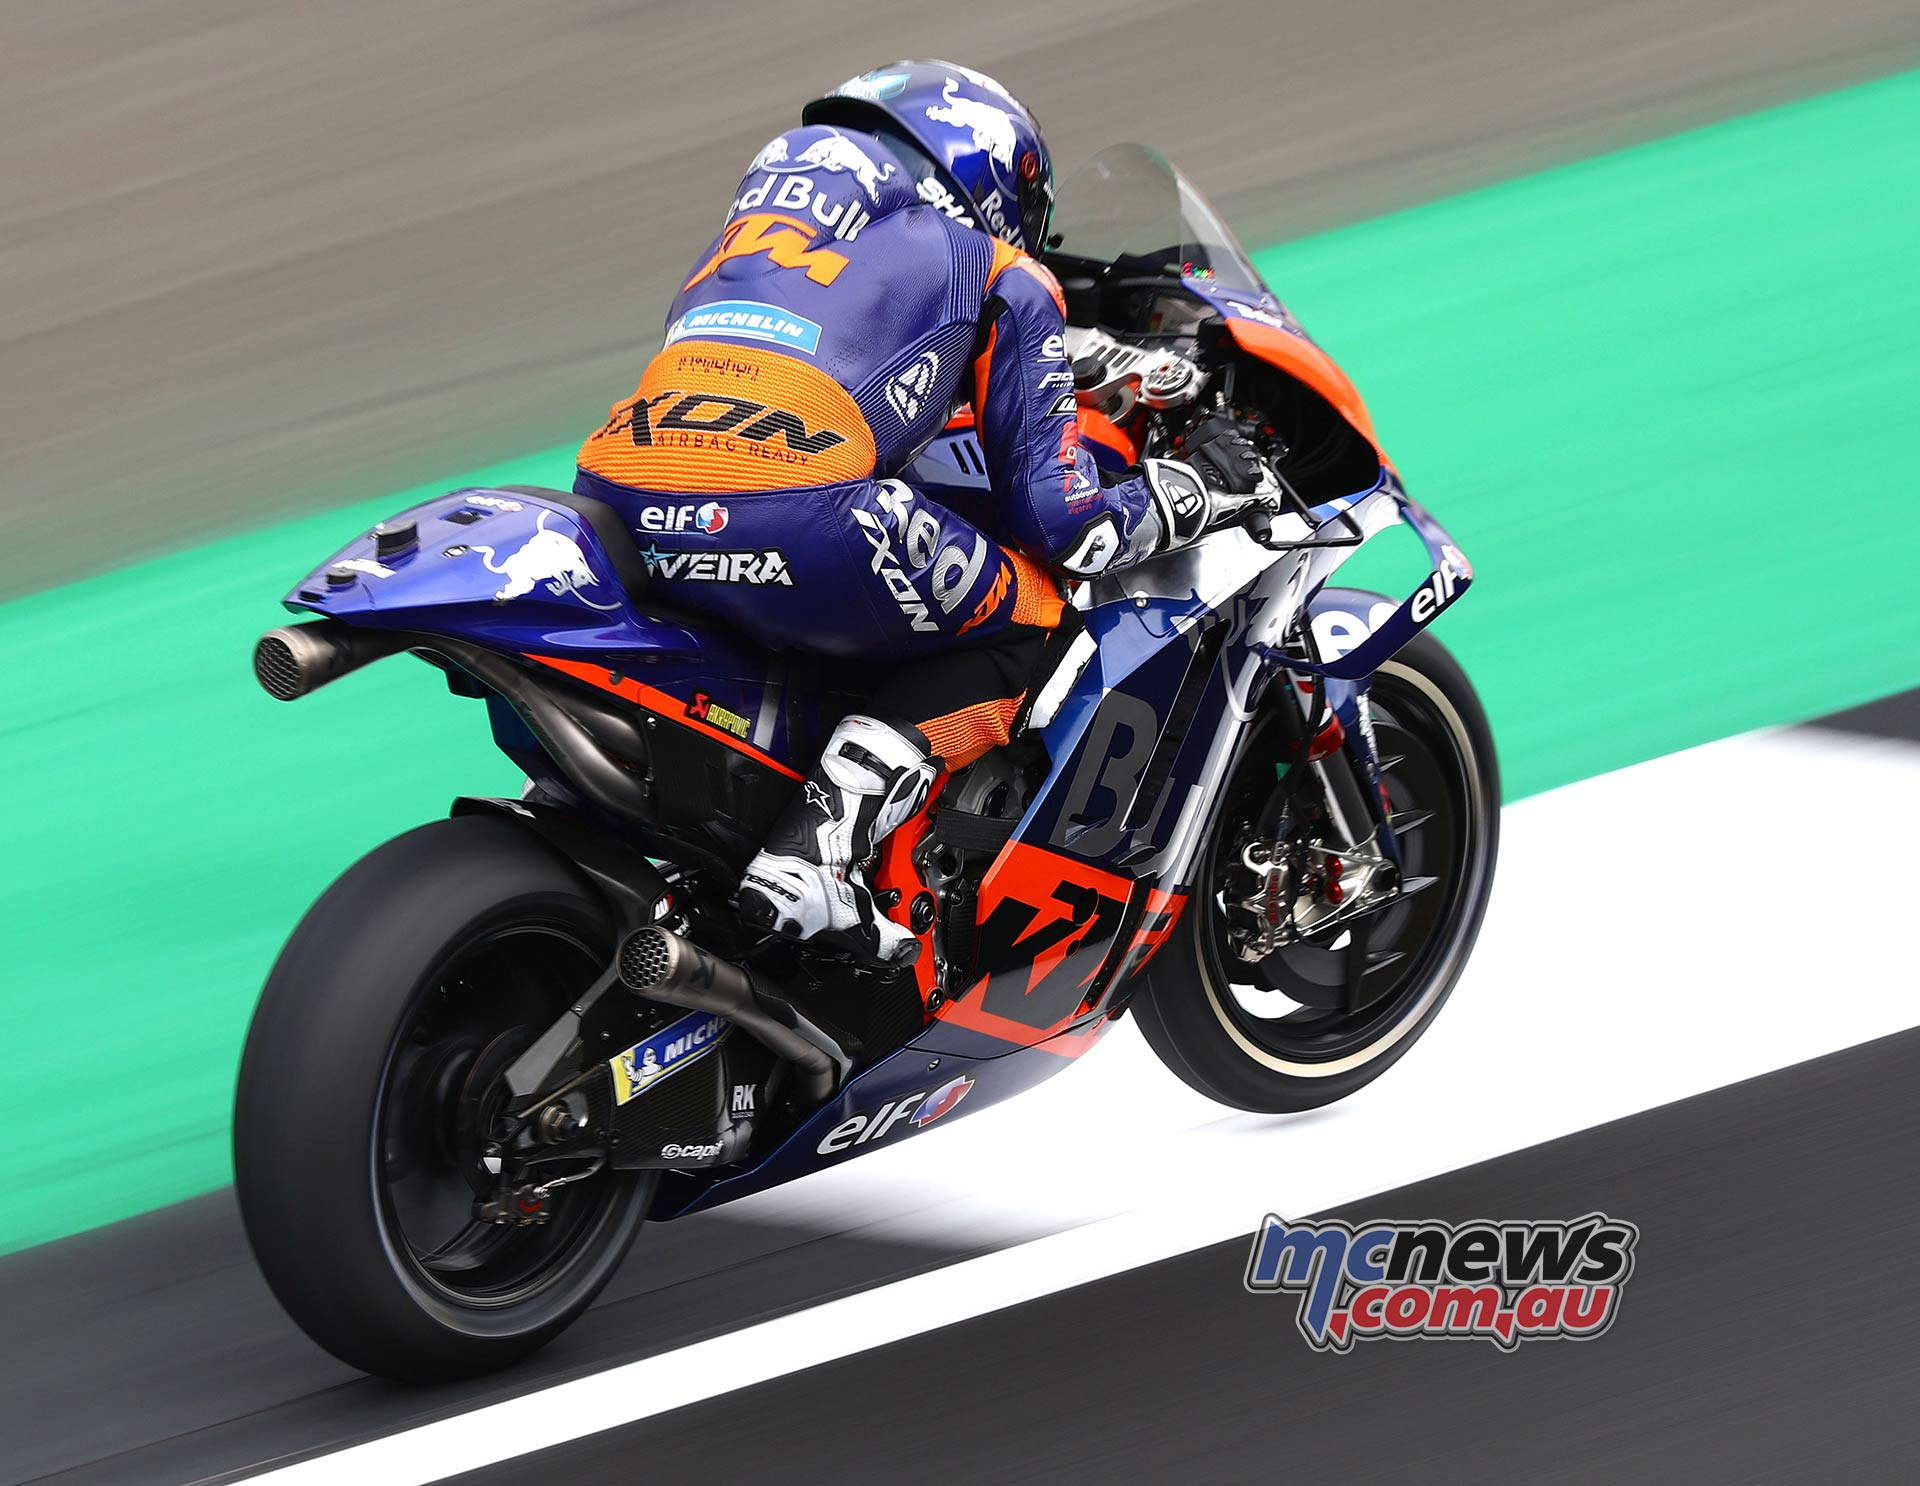 MotoGP Rnd Silverstone Fri Oliveira